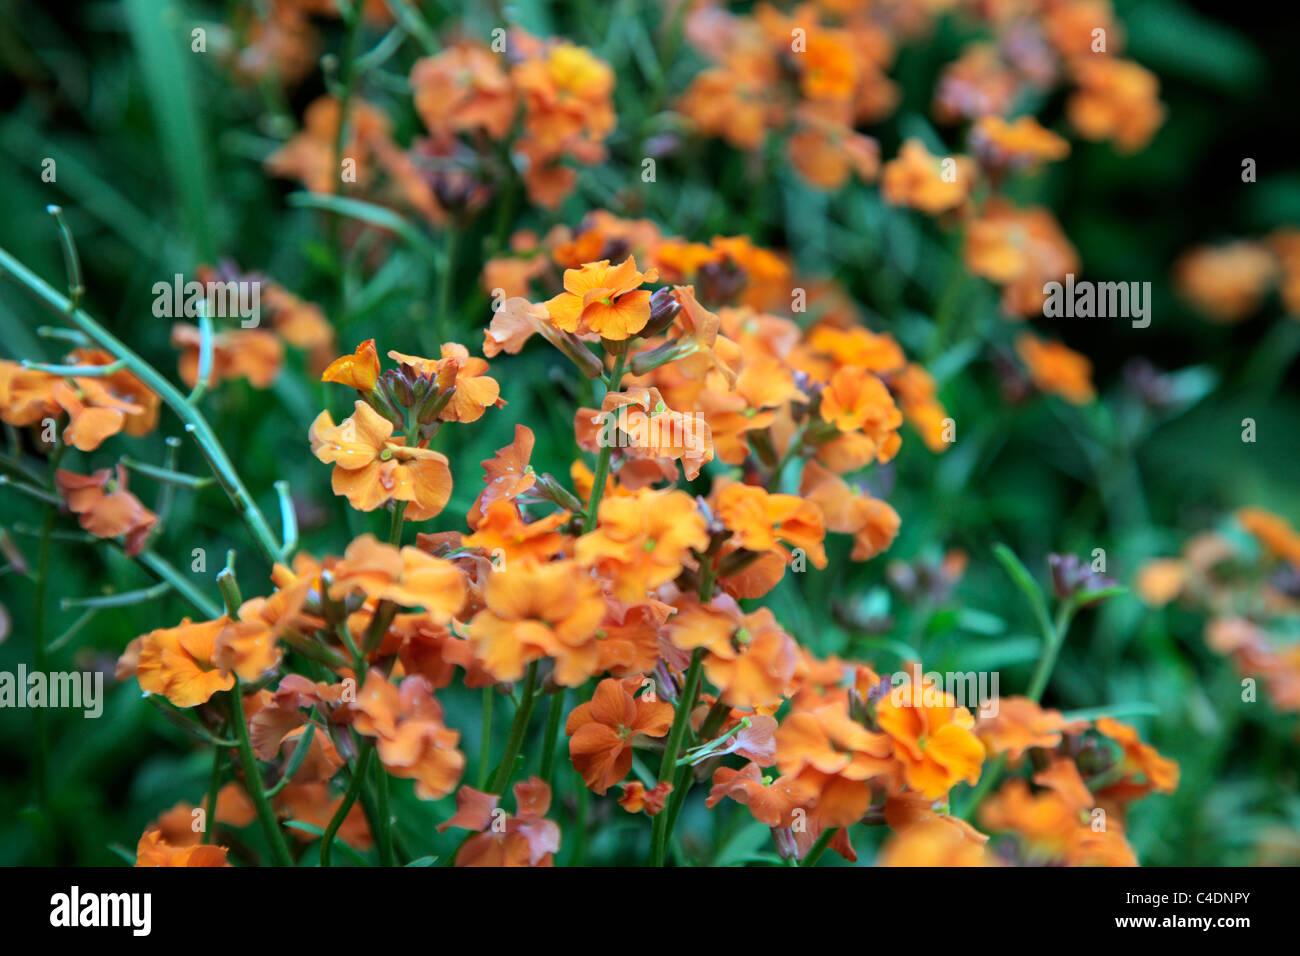 Erysimum 'Apricot Twist' - Orange Perennial wallflower - Stock Image